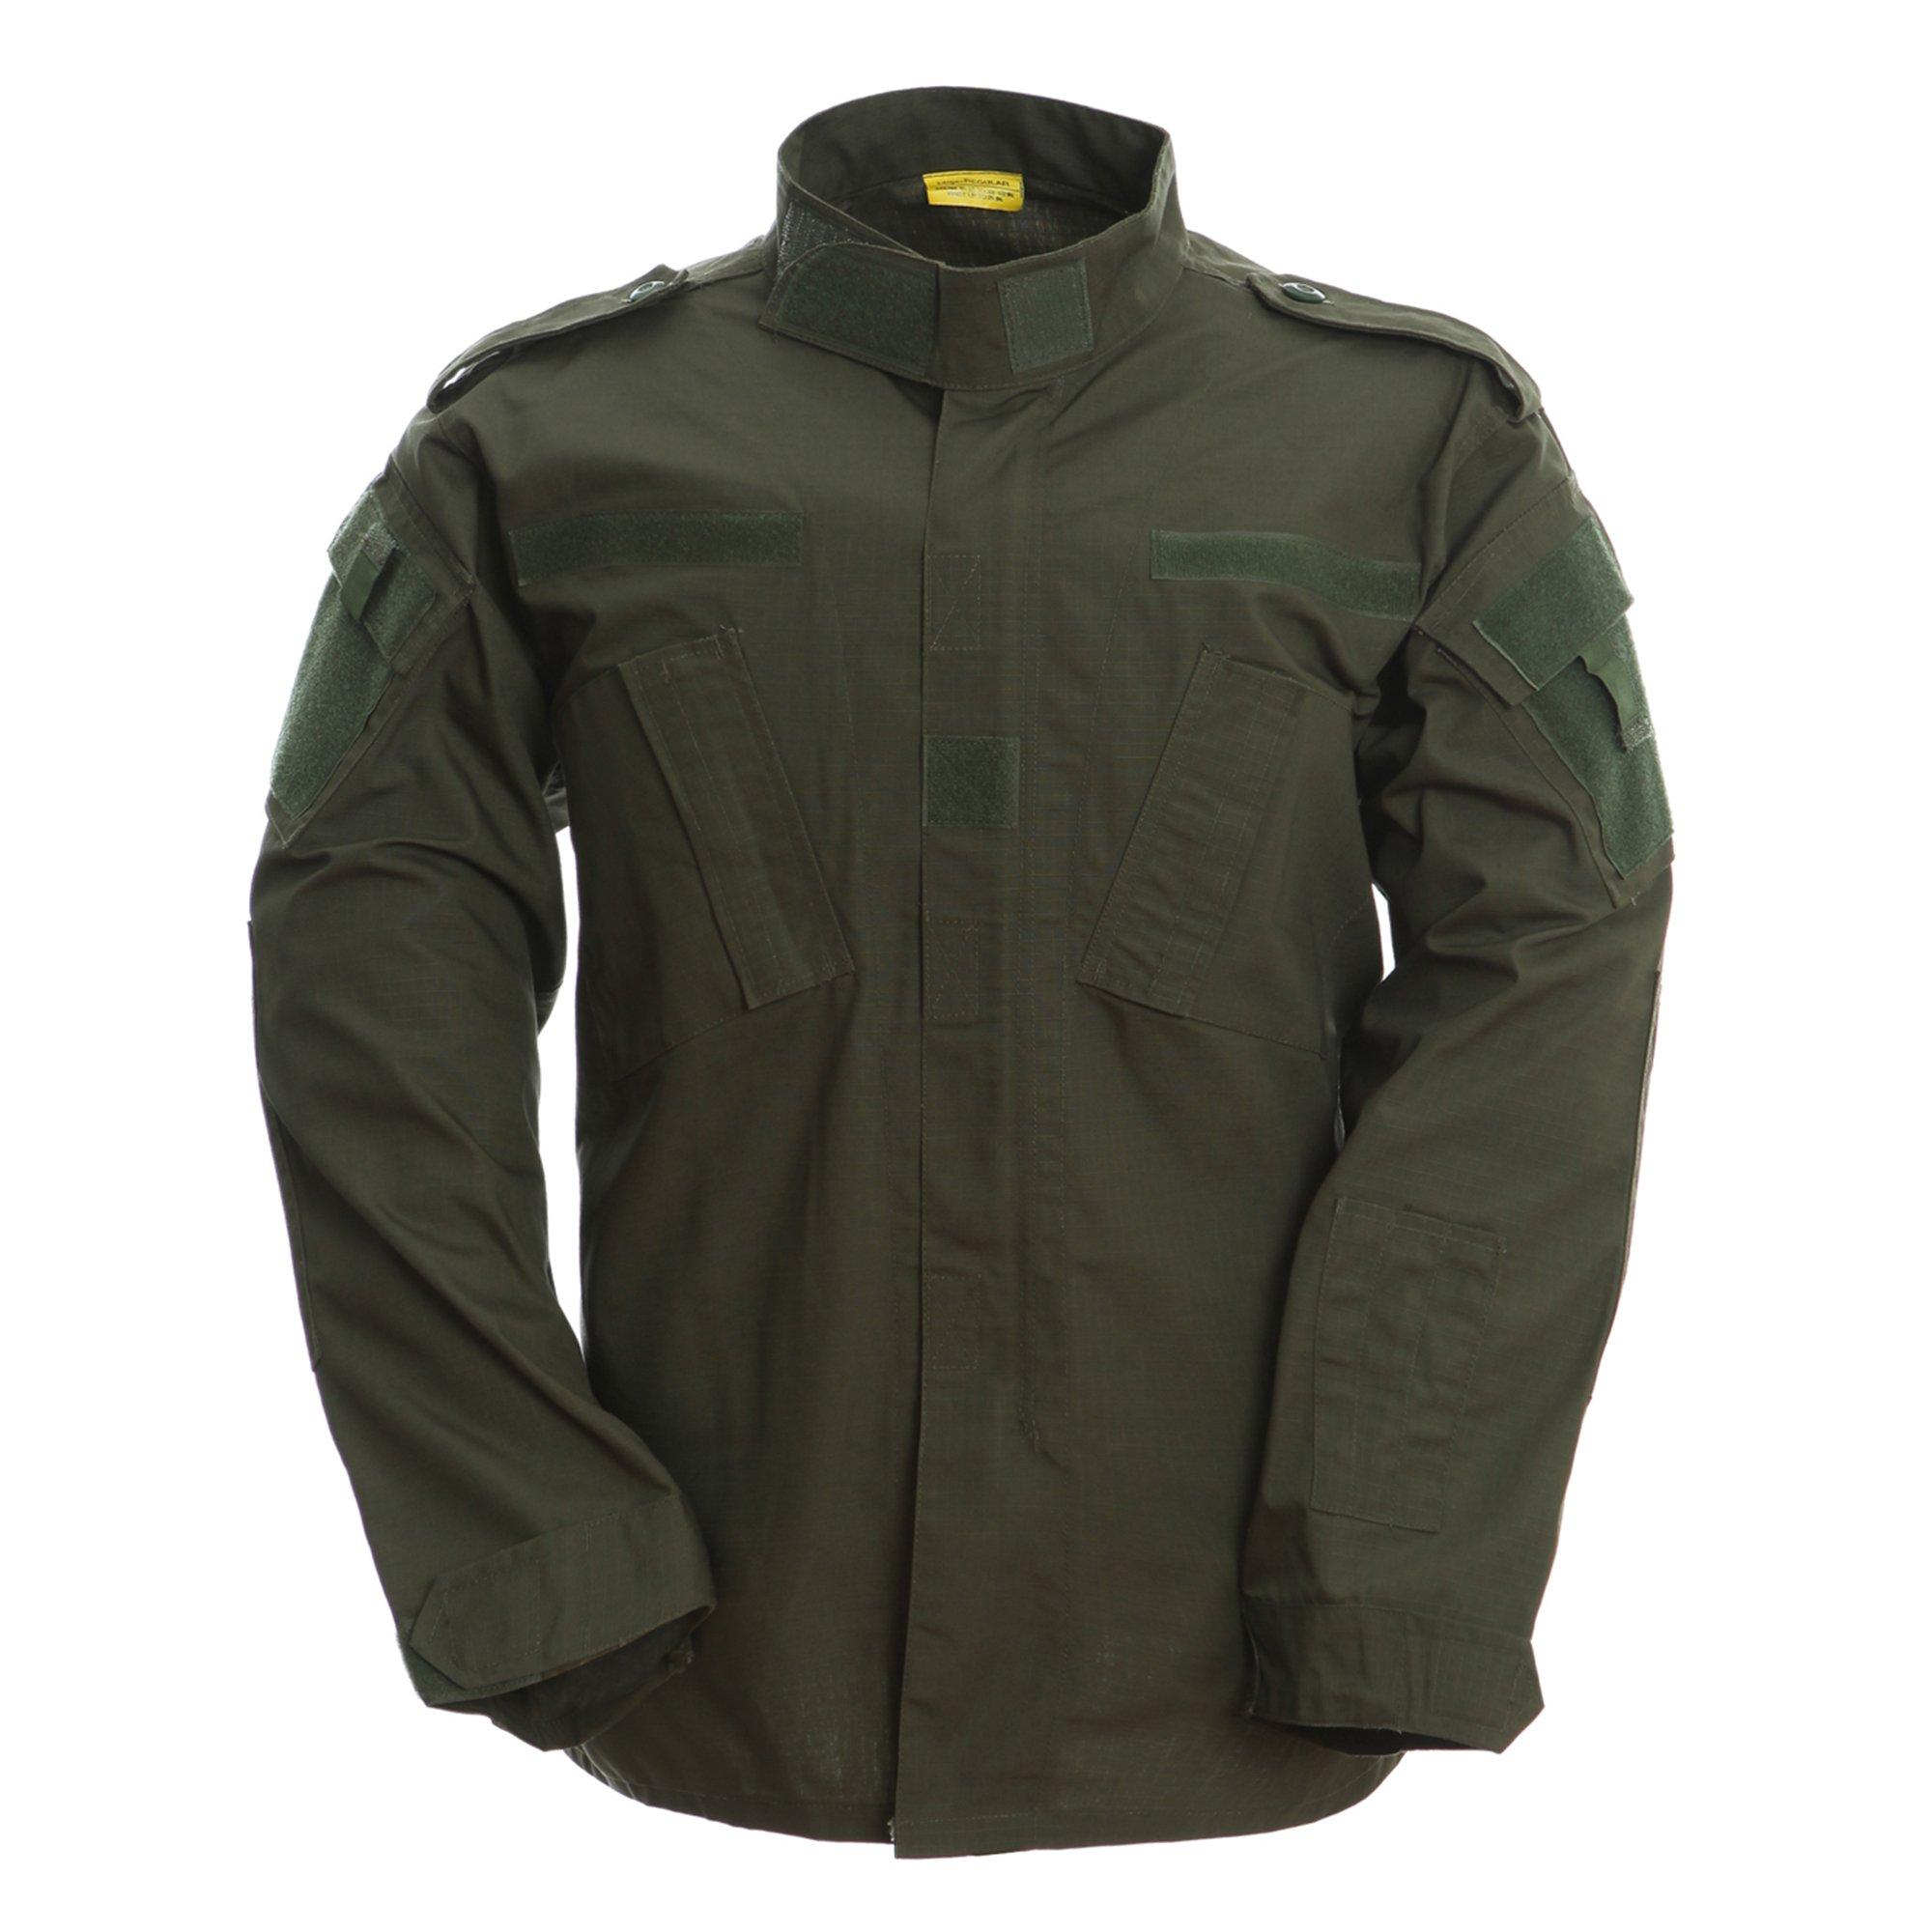 TACVASEN Men's Army Green Tactical Army Military Uniform Warm Combat Shirt Top Jacket Blouse XXL